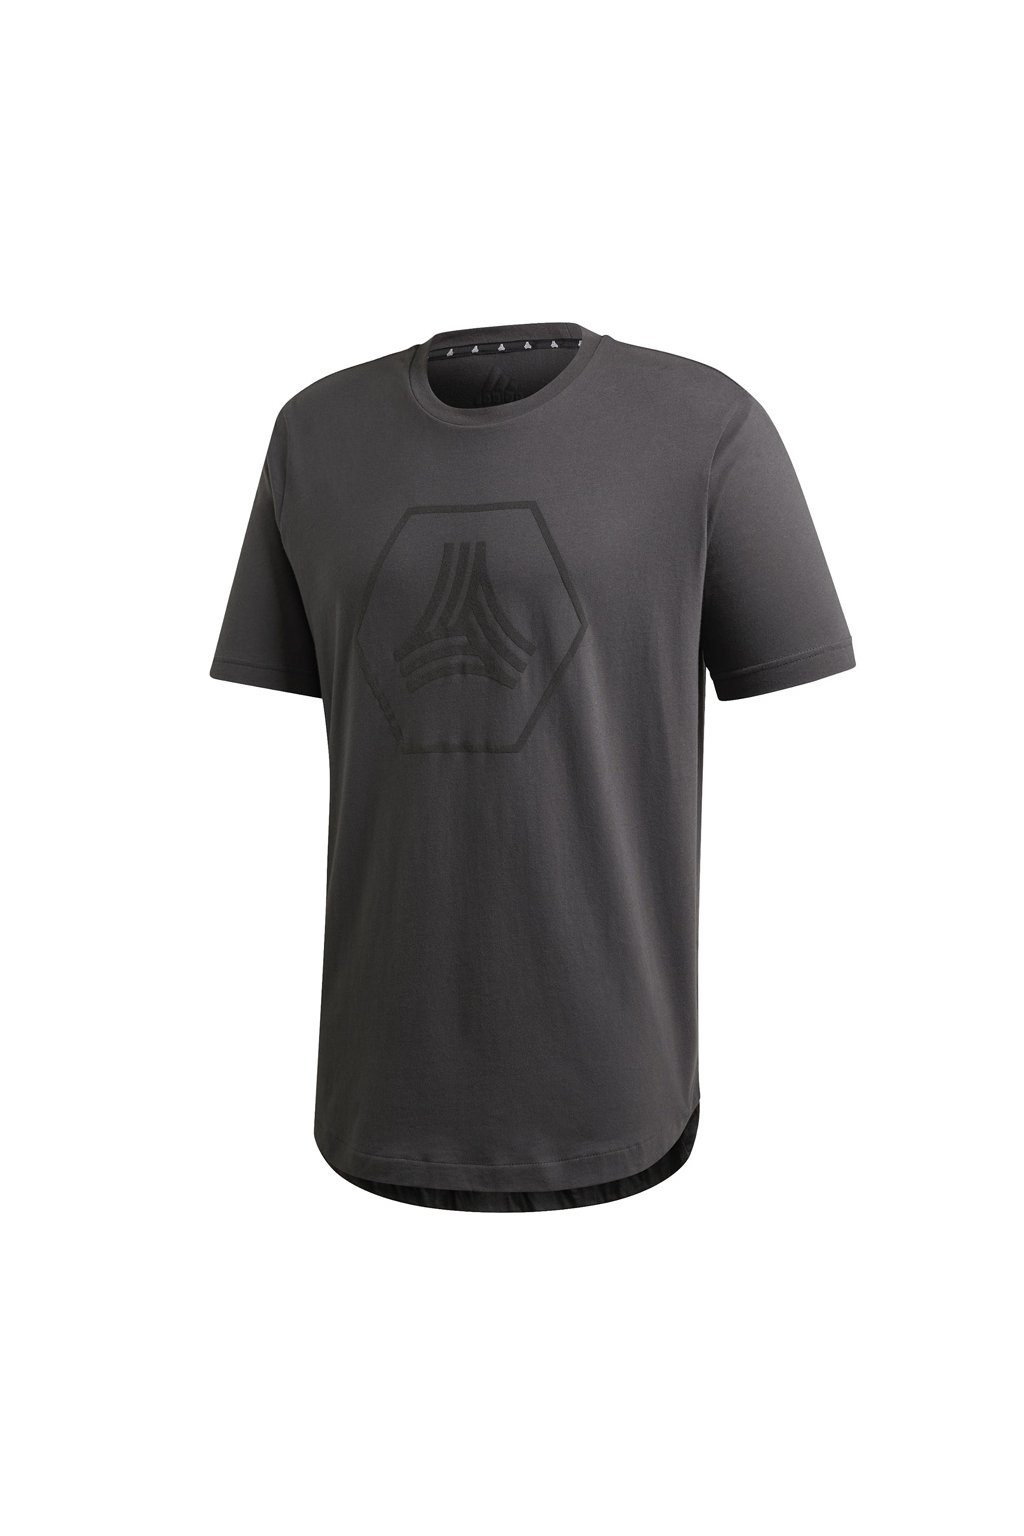 Pánske tričko adidas Tan Logo Tee sivé FM0837